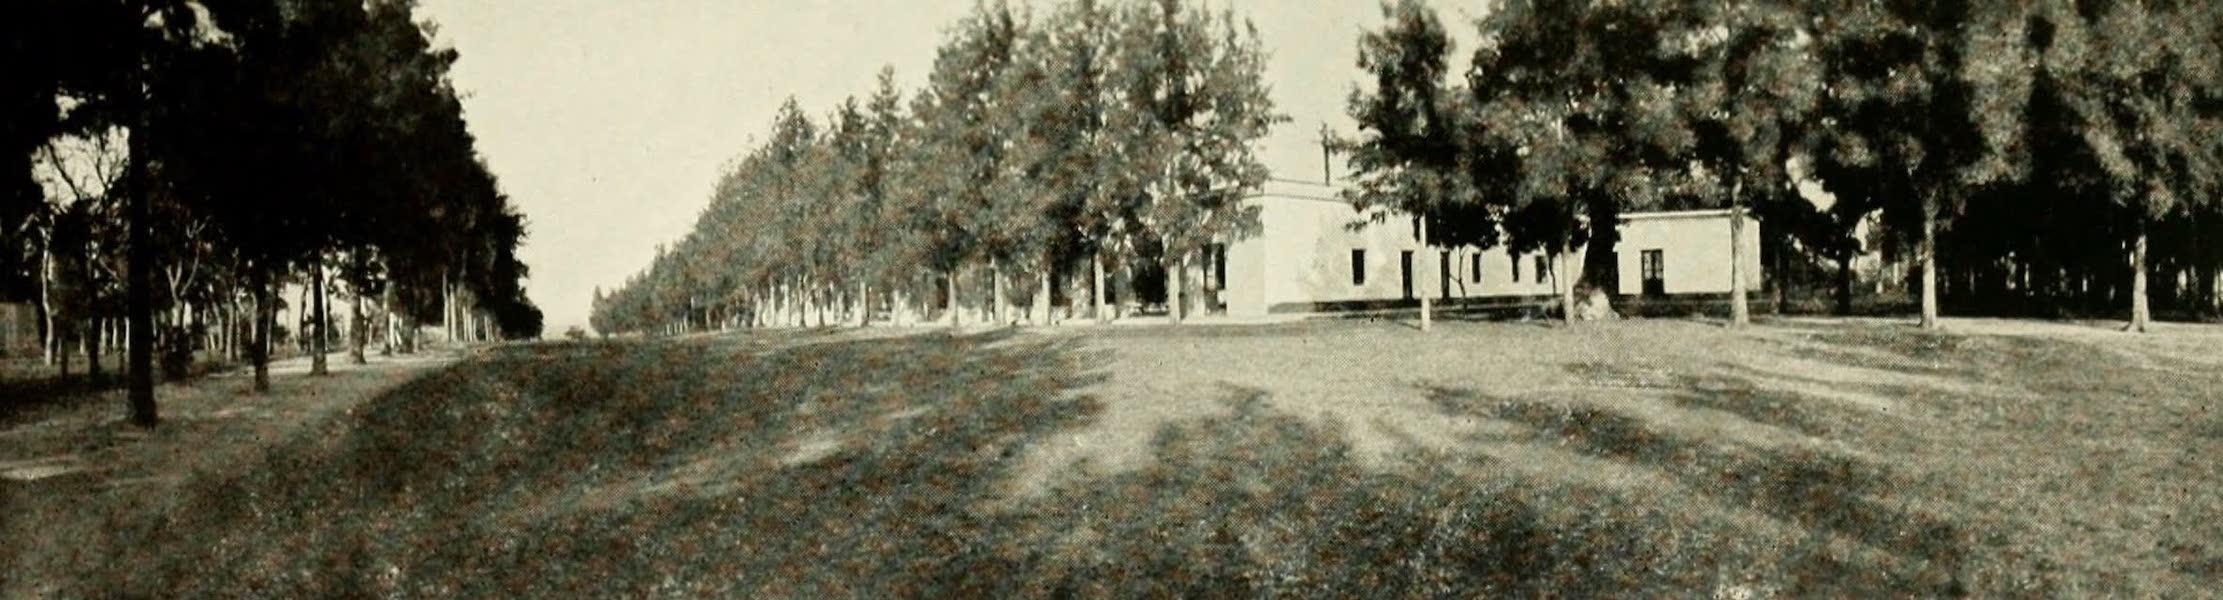 Uruguay by W. H. Koebel - The Bichadero Estancia (1911)